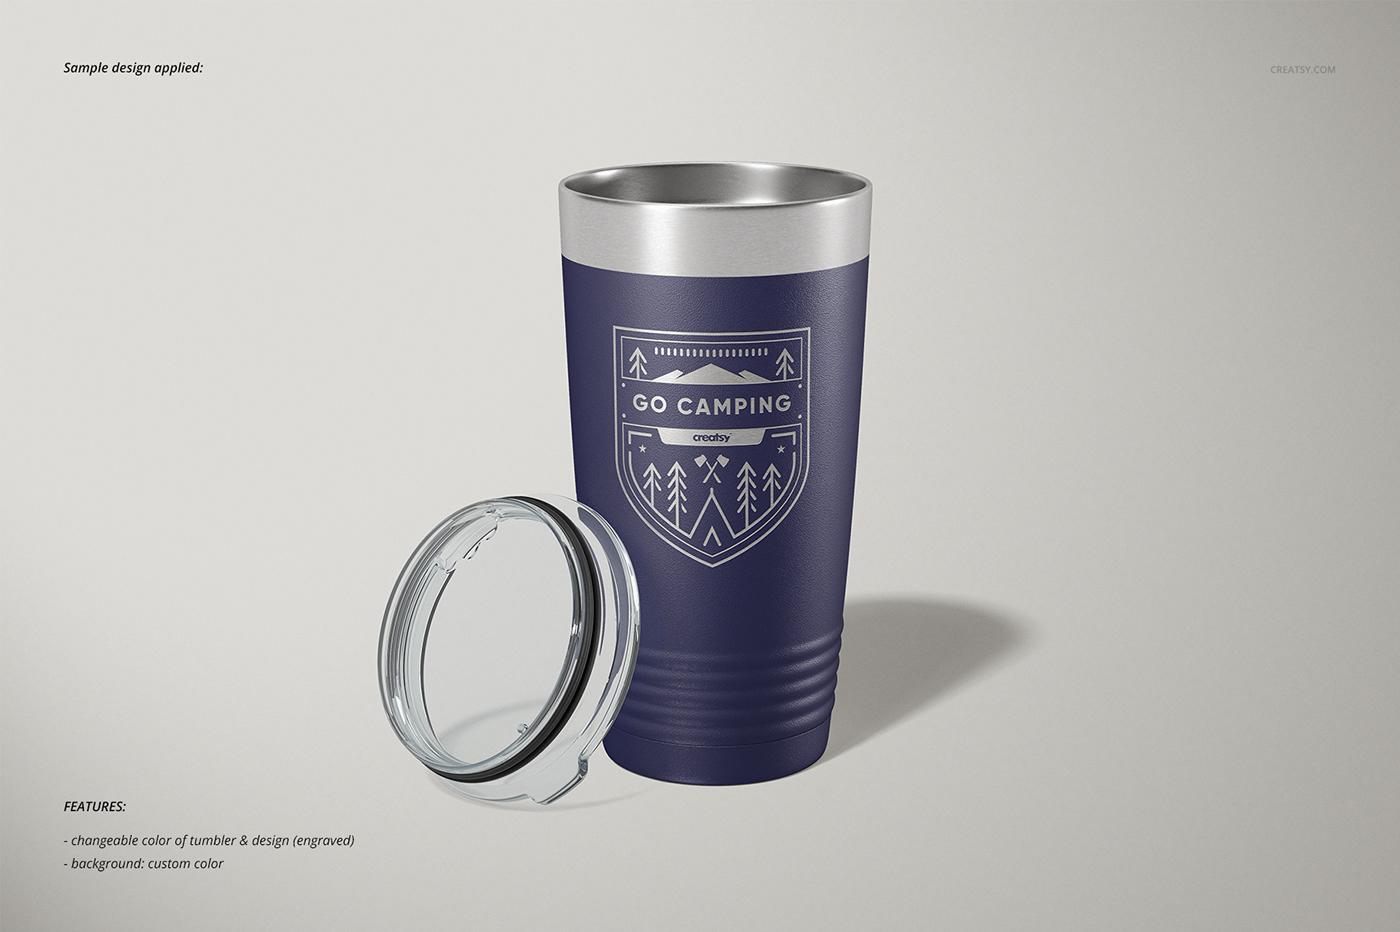 mock-up Mockup mockups template 20oz polar camel tumbler Stainless cup